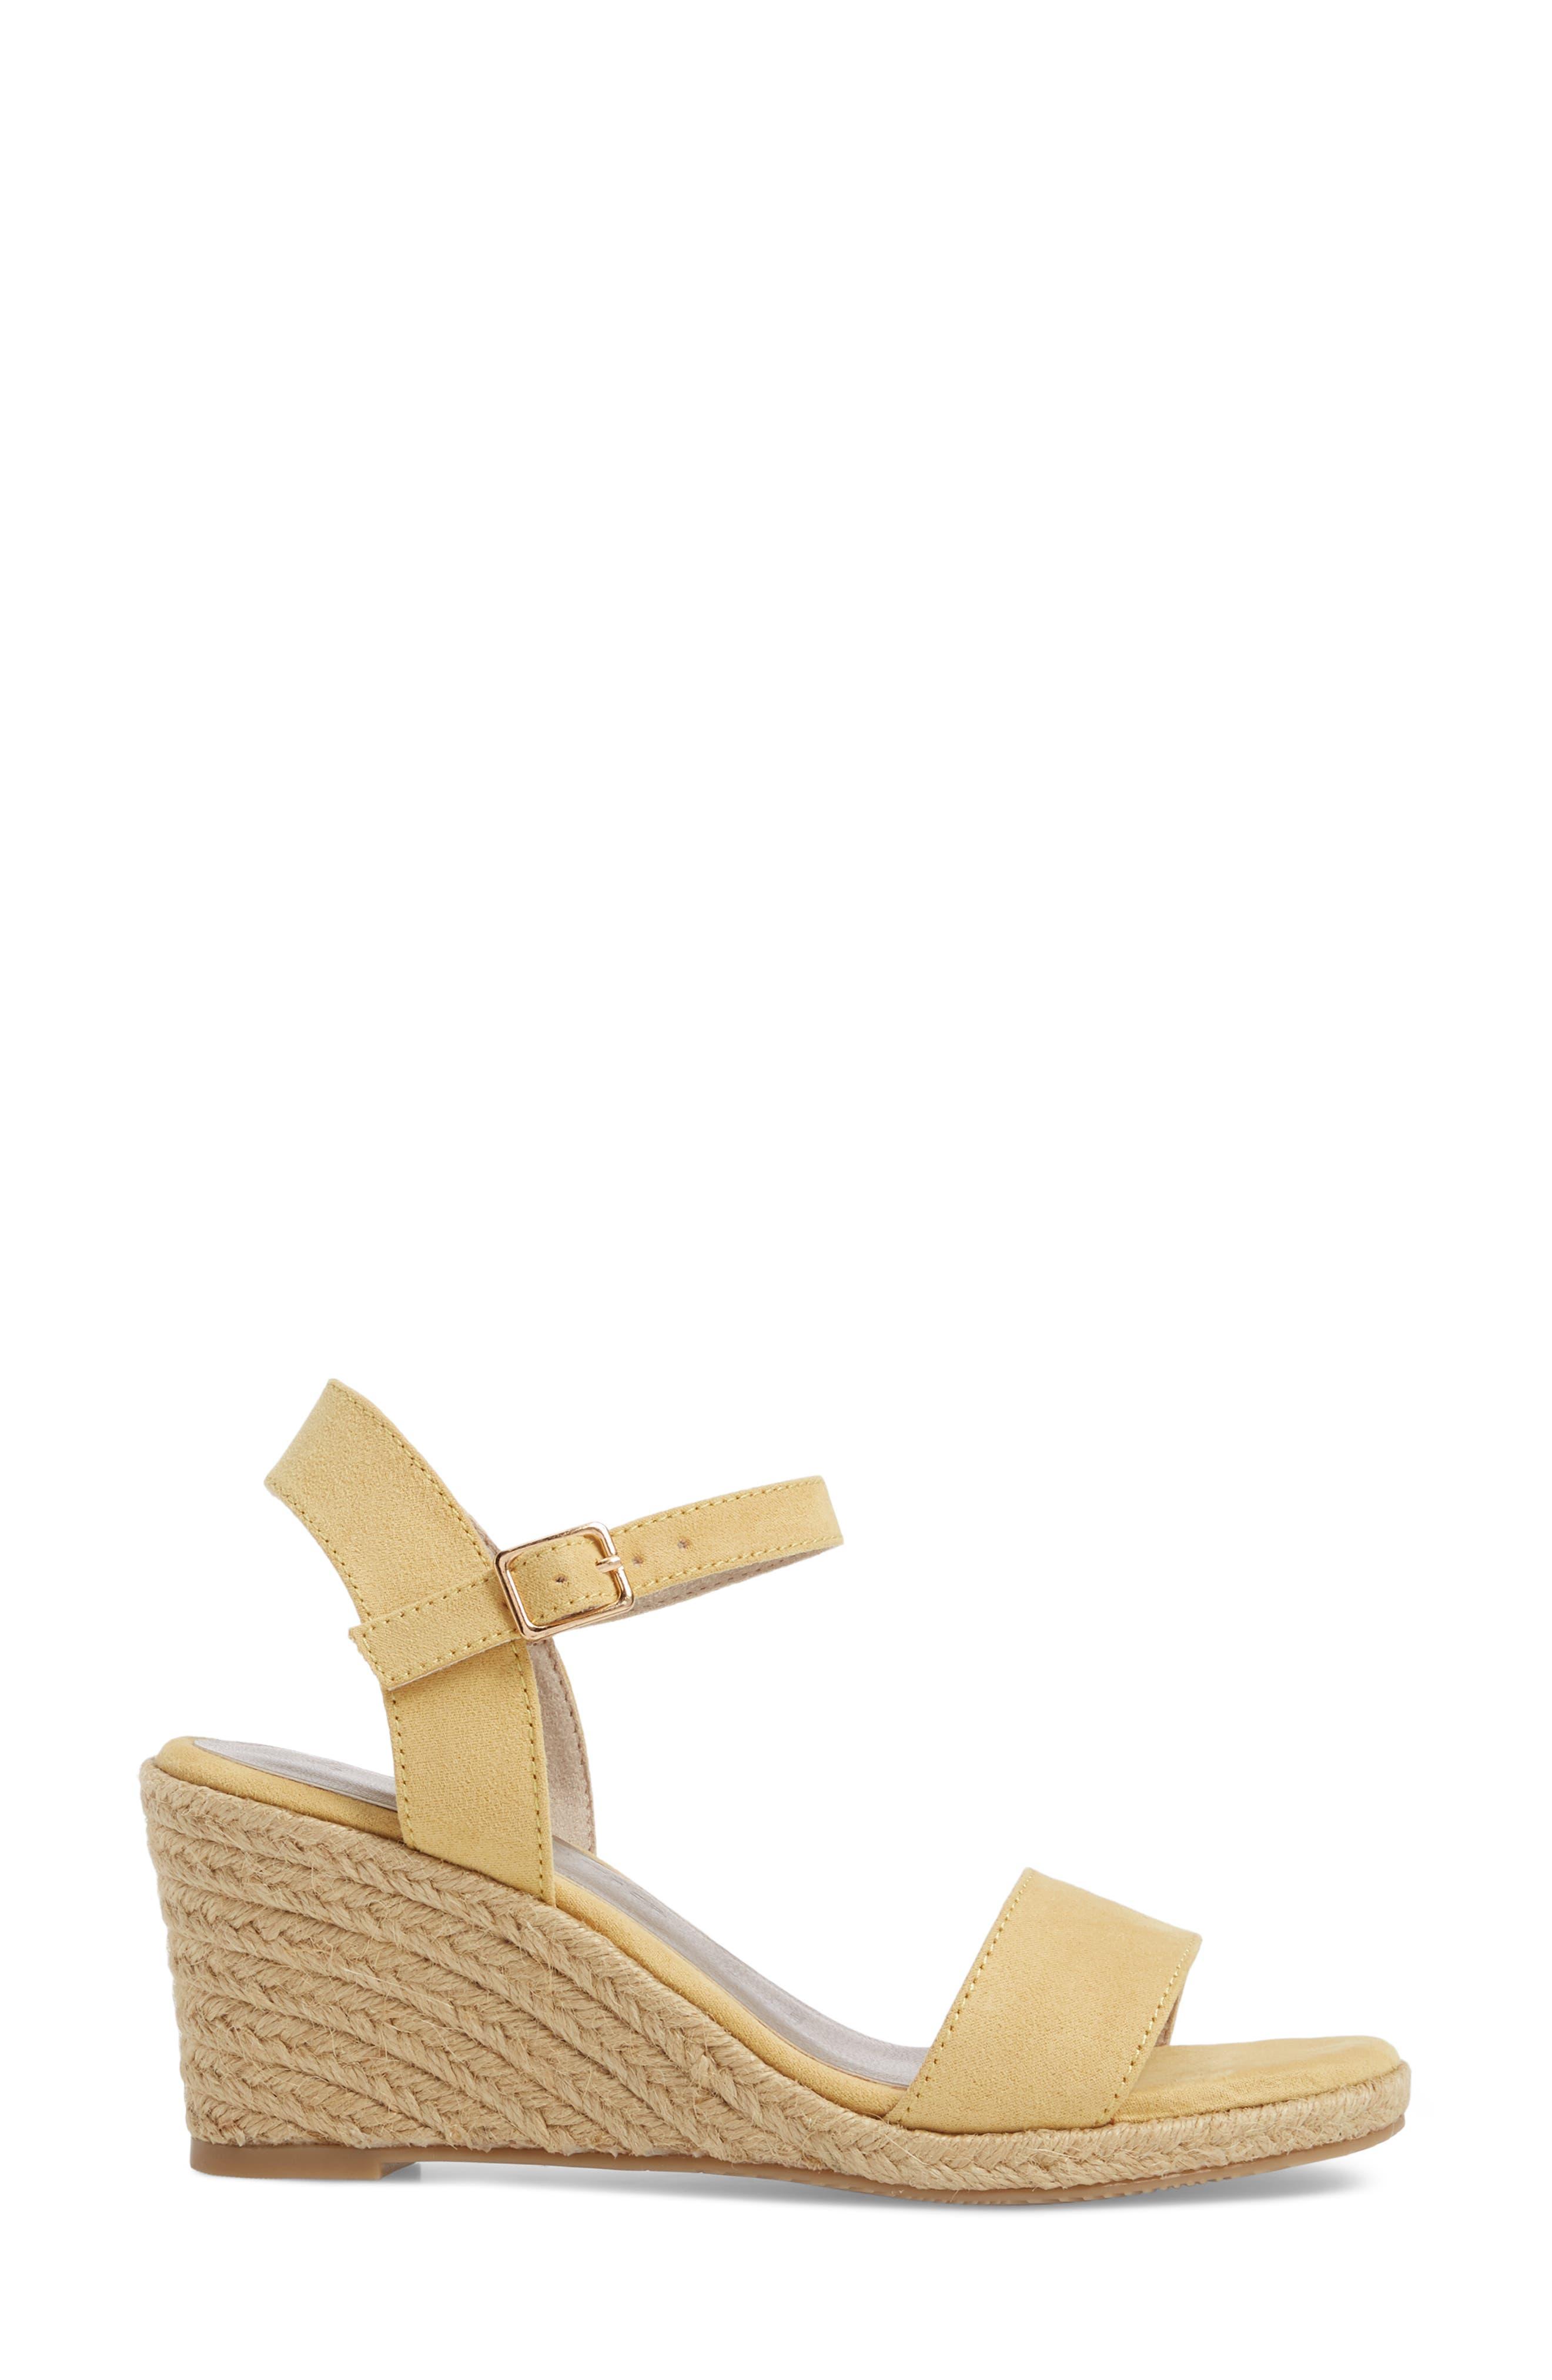 Livia Espadrille Wedge Sandal,                             Alternate thumbnail 3, color,                             Saffron Fabric